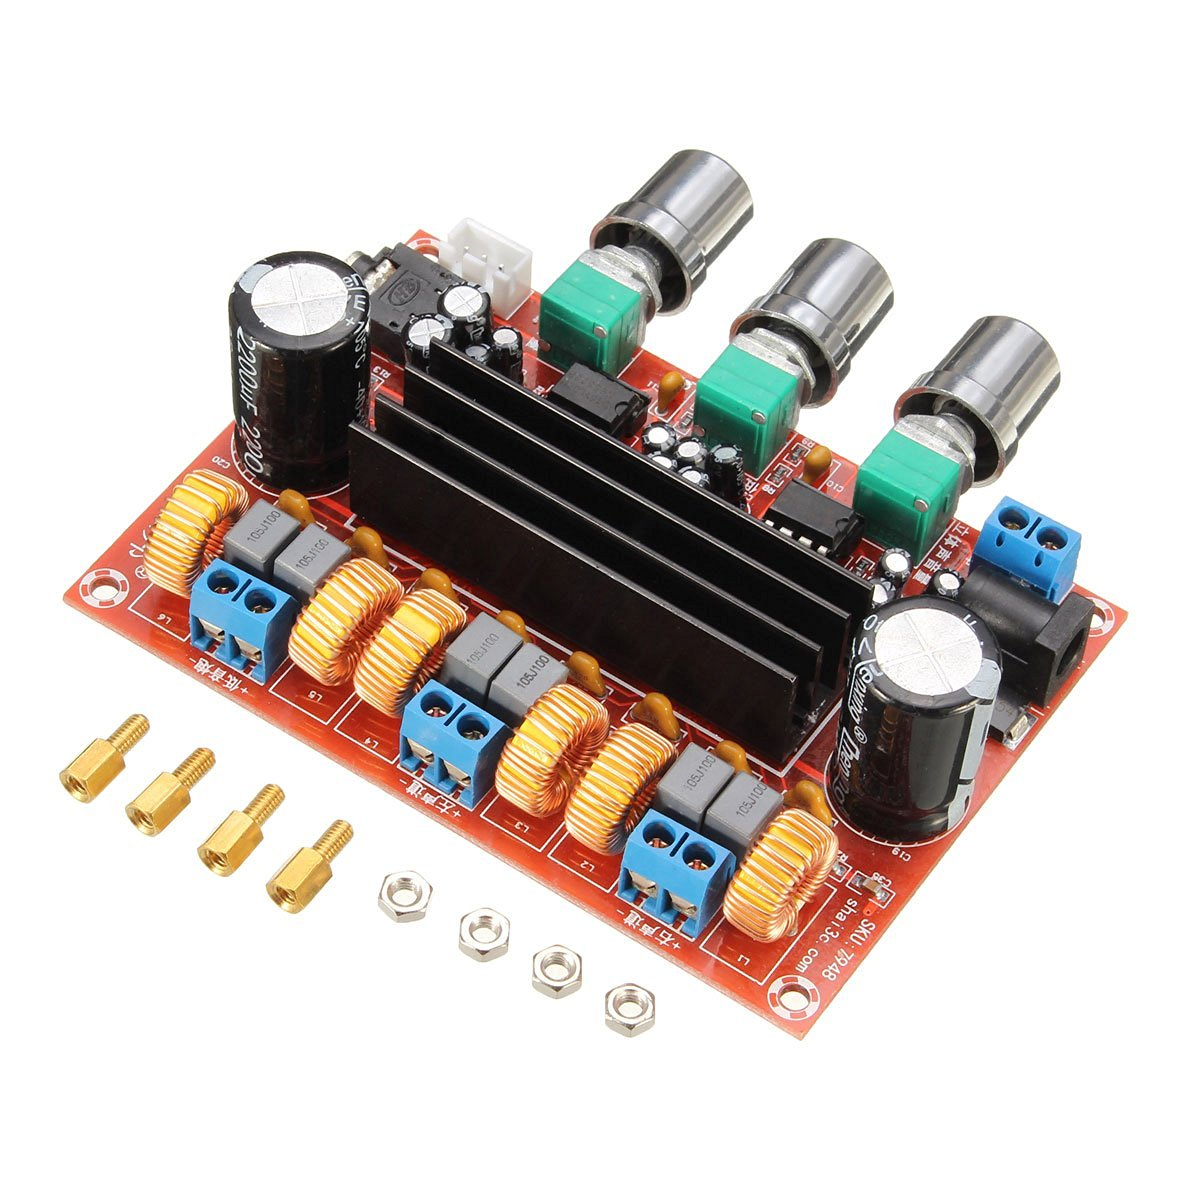 Amplifier Board Kit 50wx2 100w High Power 21 Channel Digital Hi Fi 1channel Amp Wiring Diagram Bass Stereo Subwoofer 12v 24v In Multichannel Amplifiers From